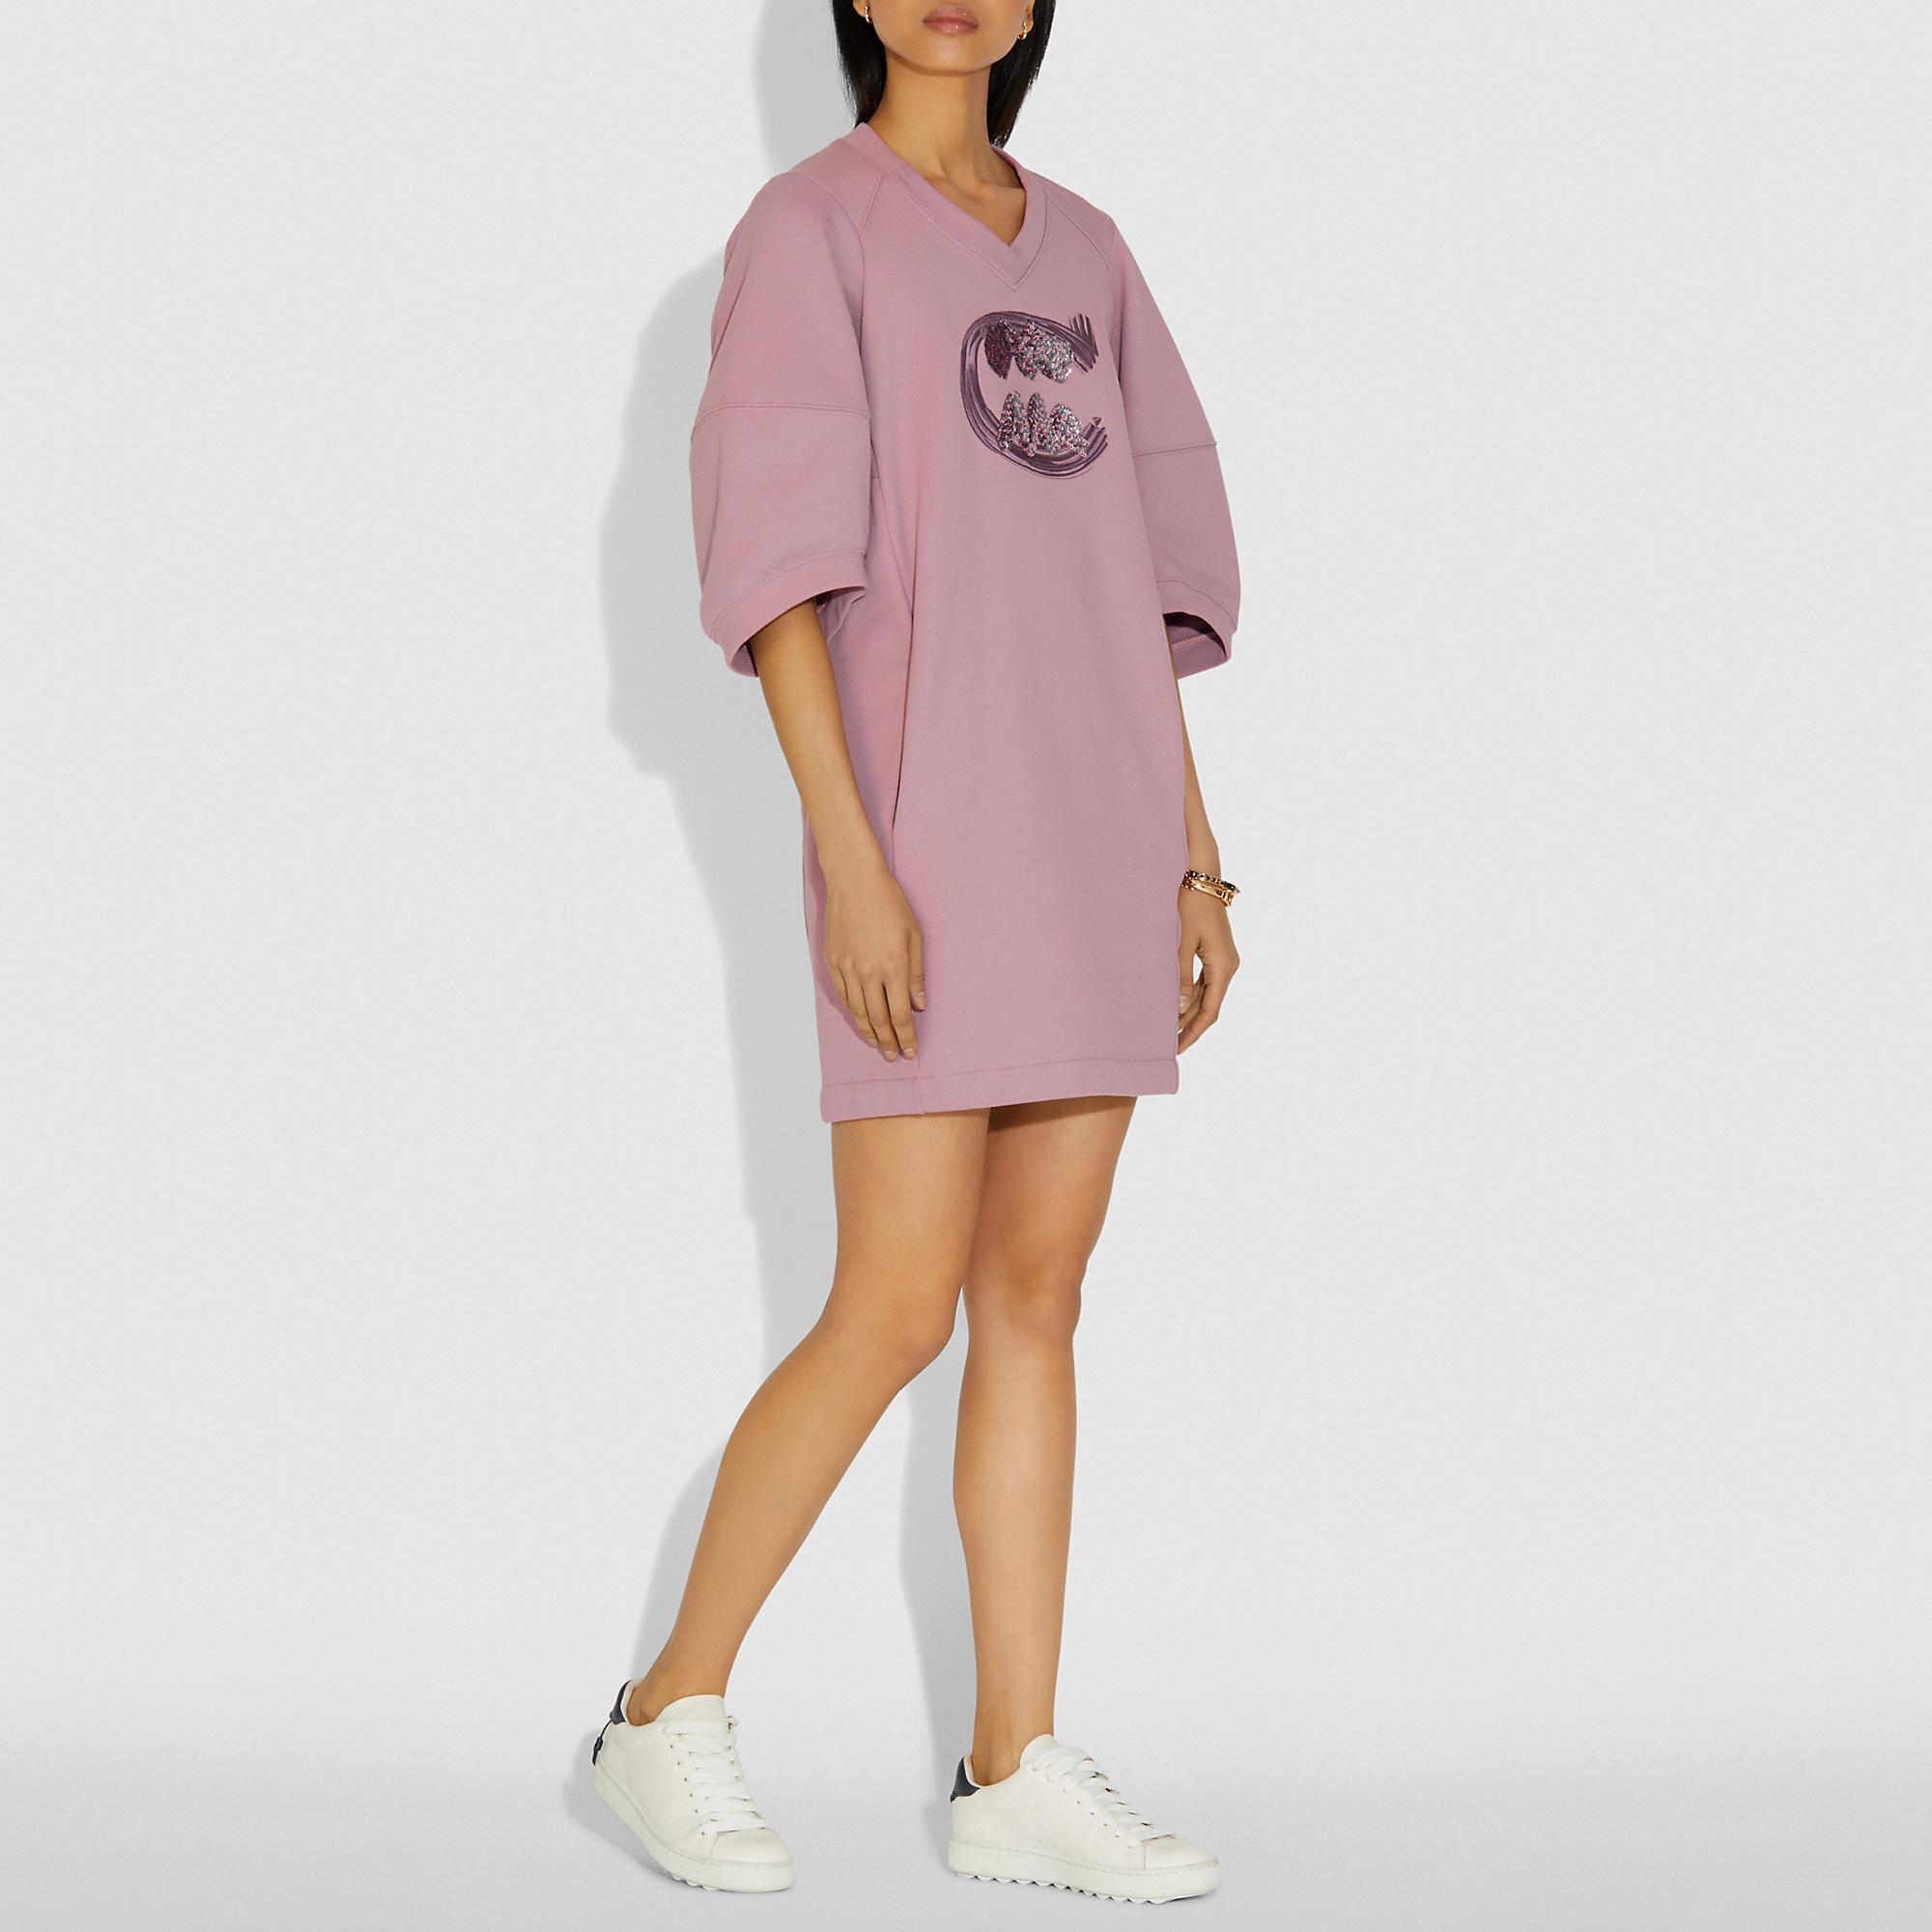 Women S Designer Clothing Sale Coach Sweatshirt Dress Sweatshirt Short Sleeve Designer Outfits Woman